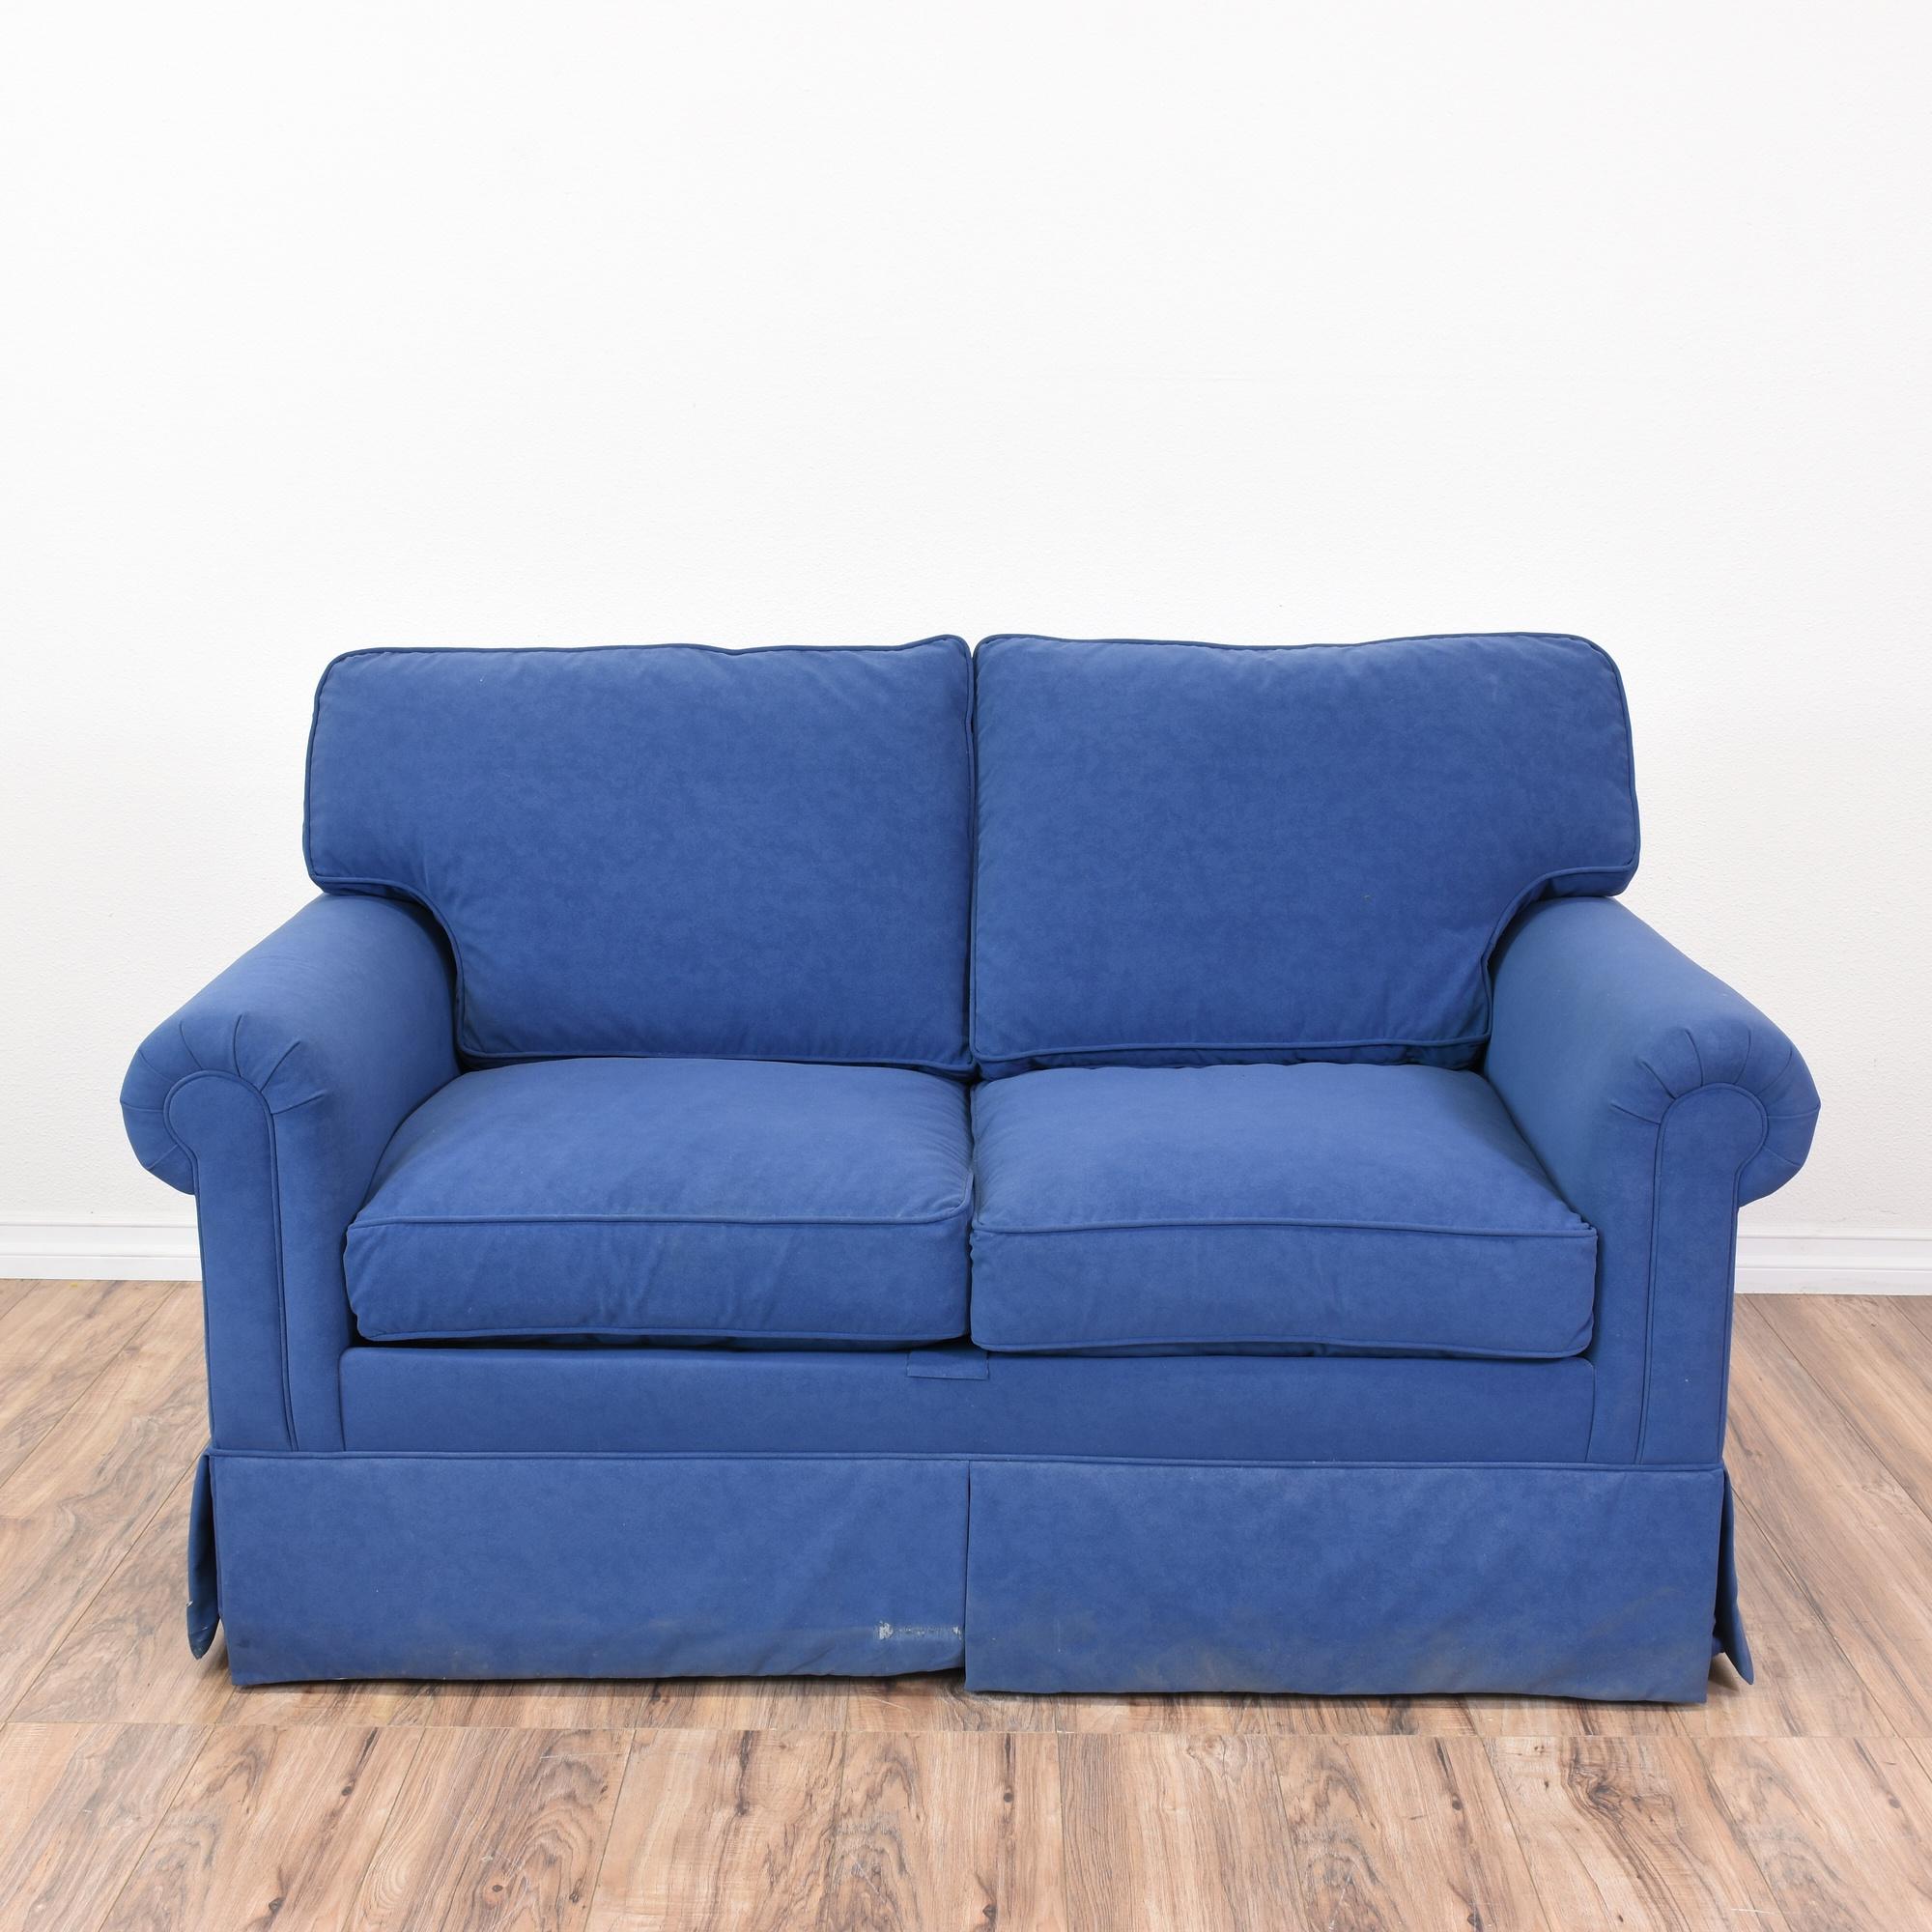 Vibrant Blue Ethan Allen Loveseat Sofa Loveseat Vintage Furniture San Diego Los Angeles